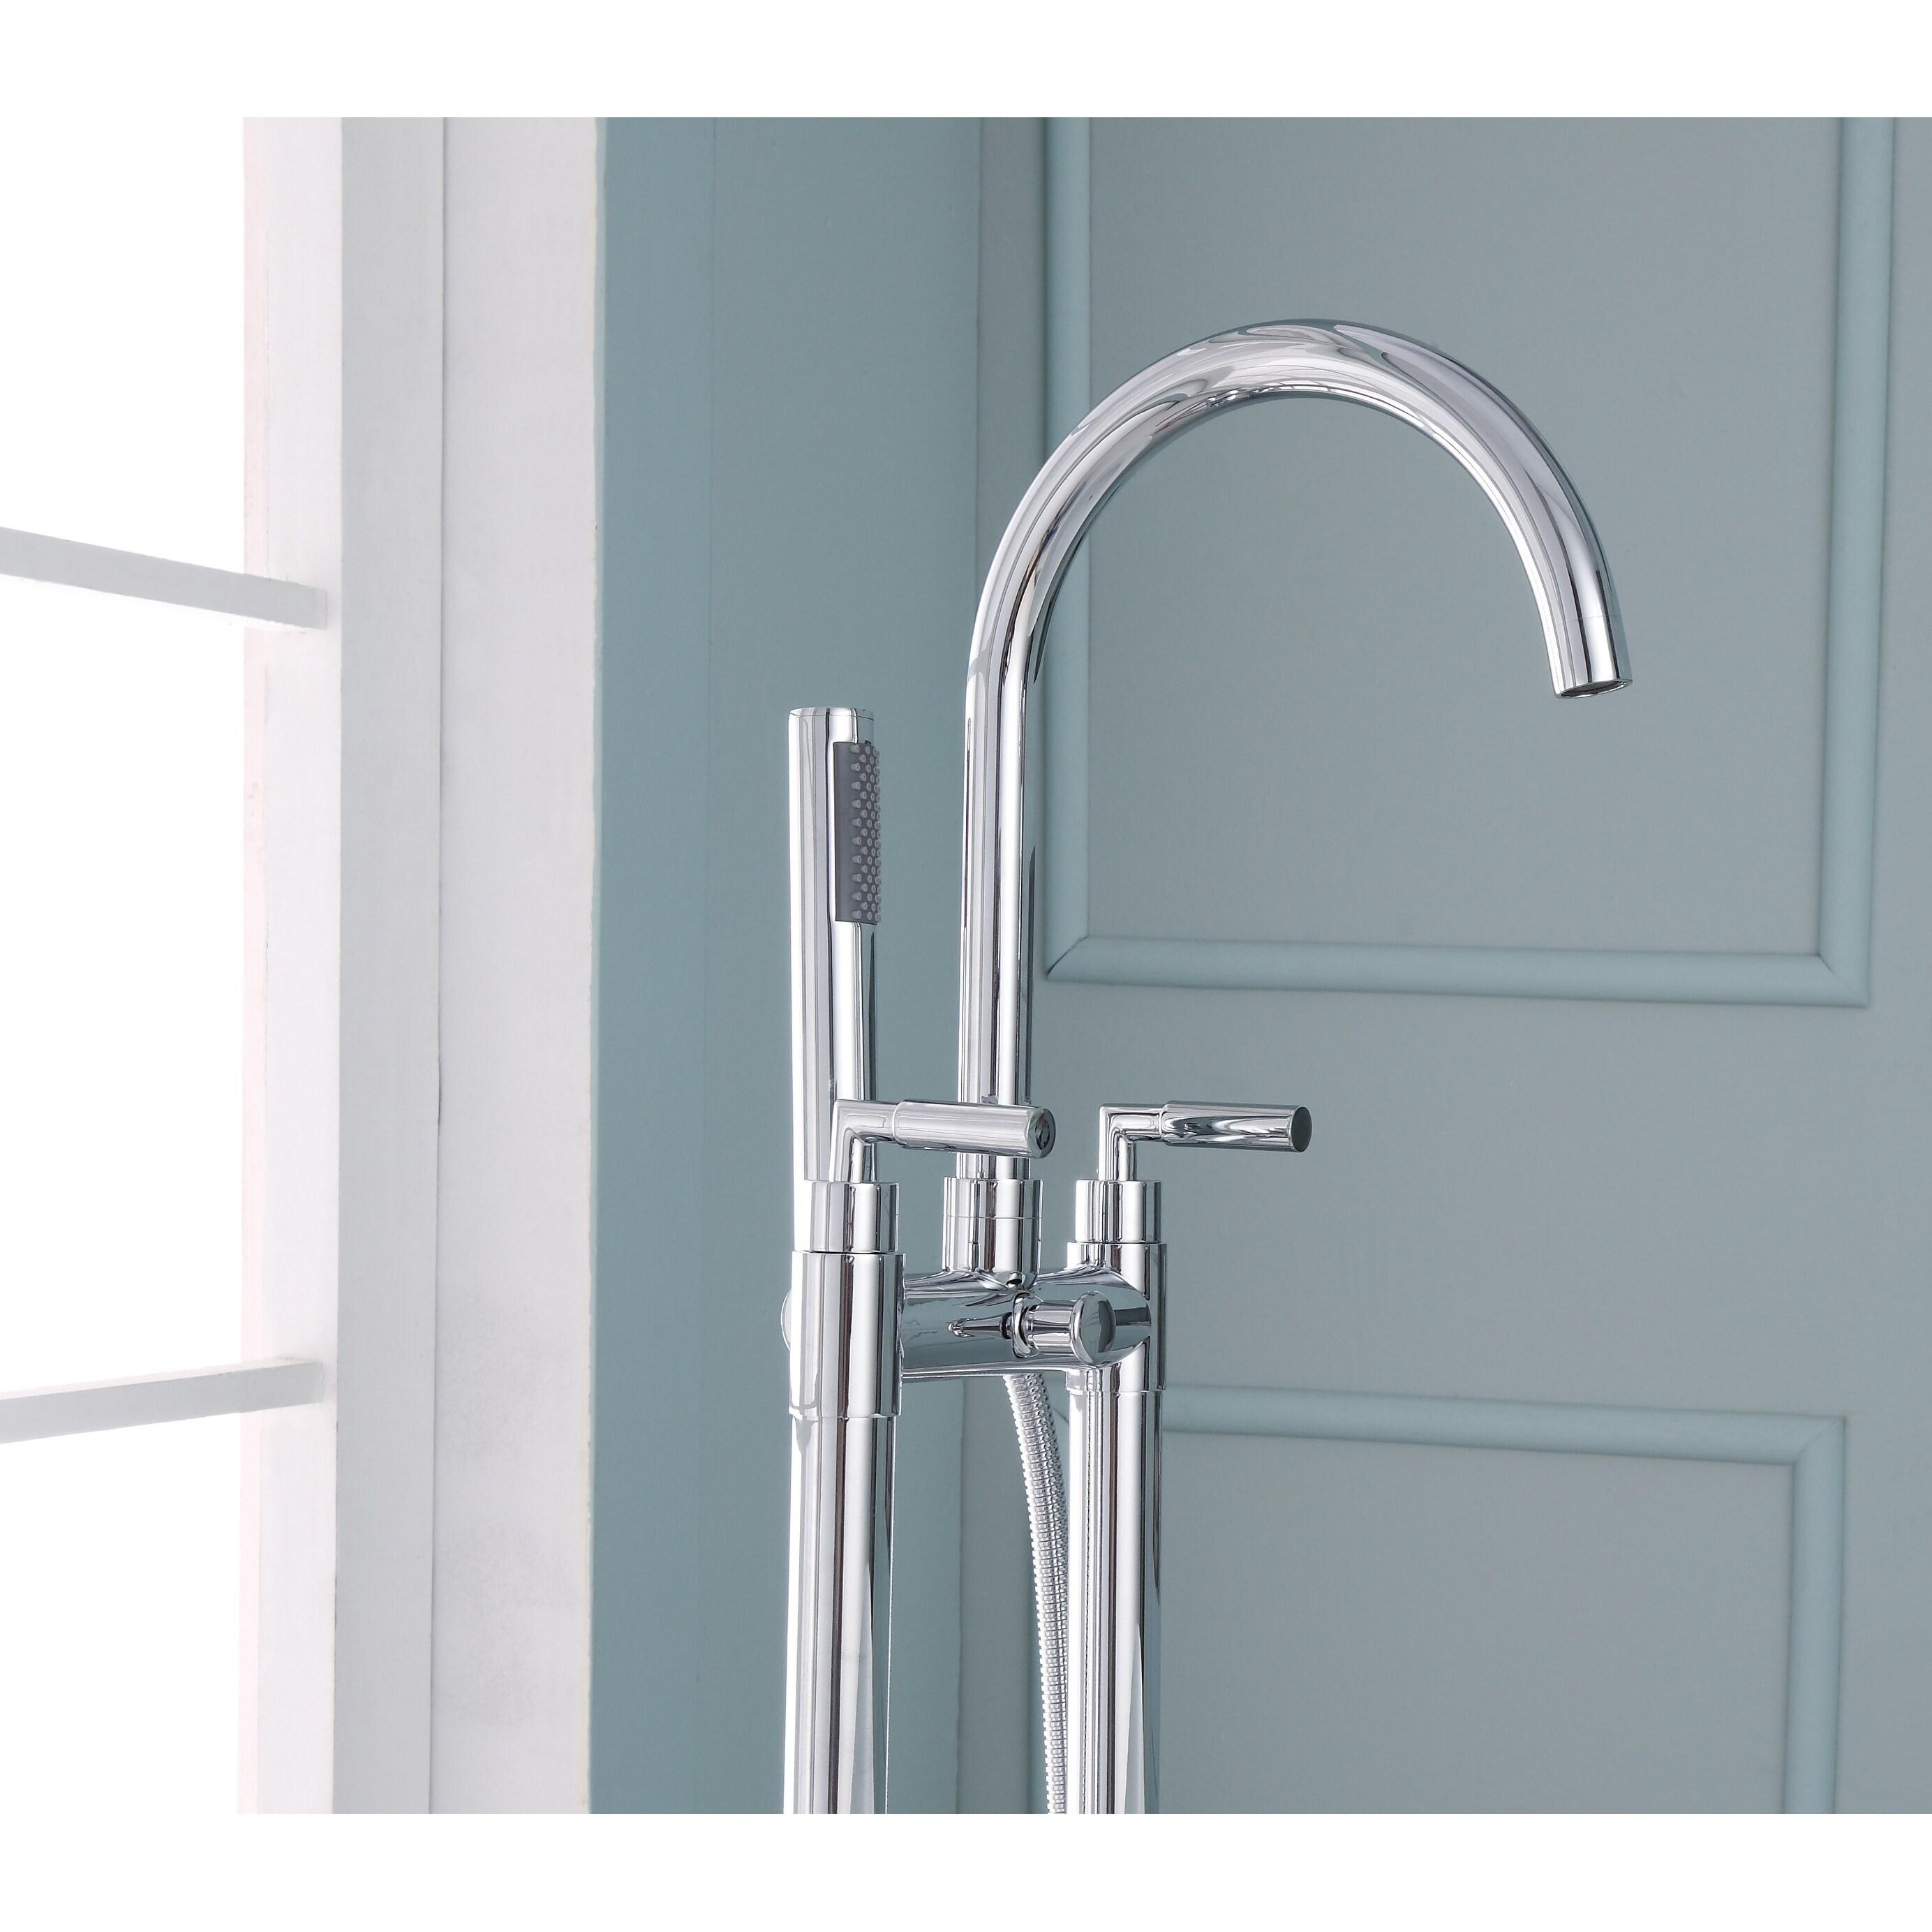 Famous Shower Handle Image Collection - Bathtub Ideas - dilata.info